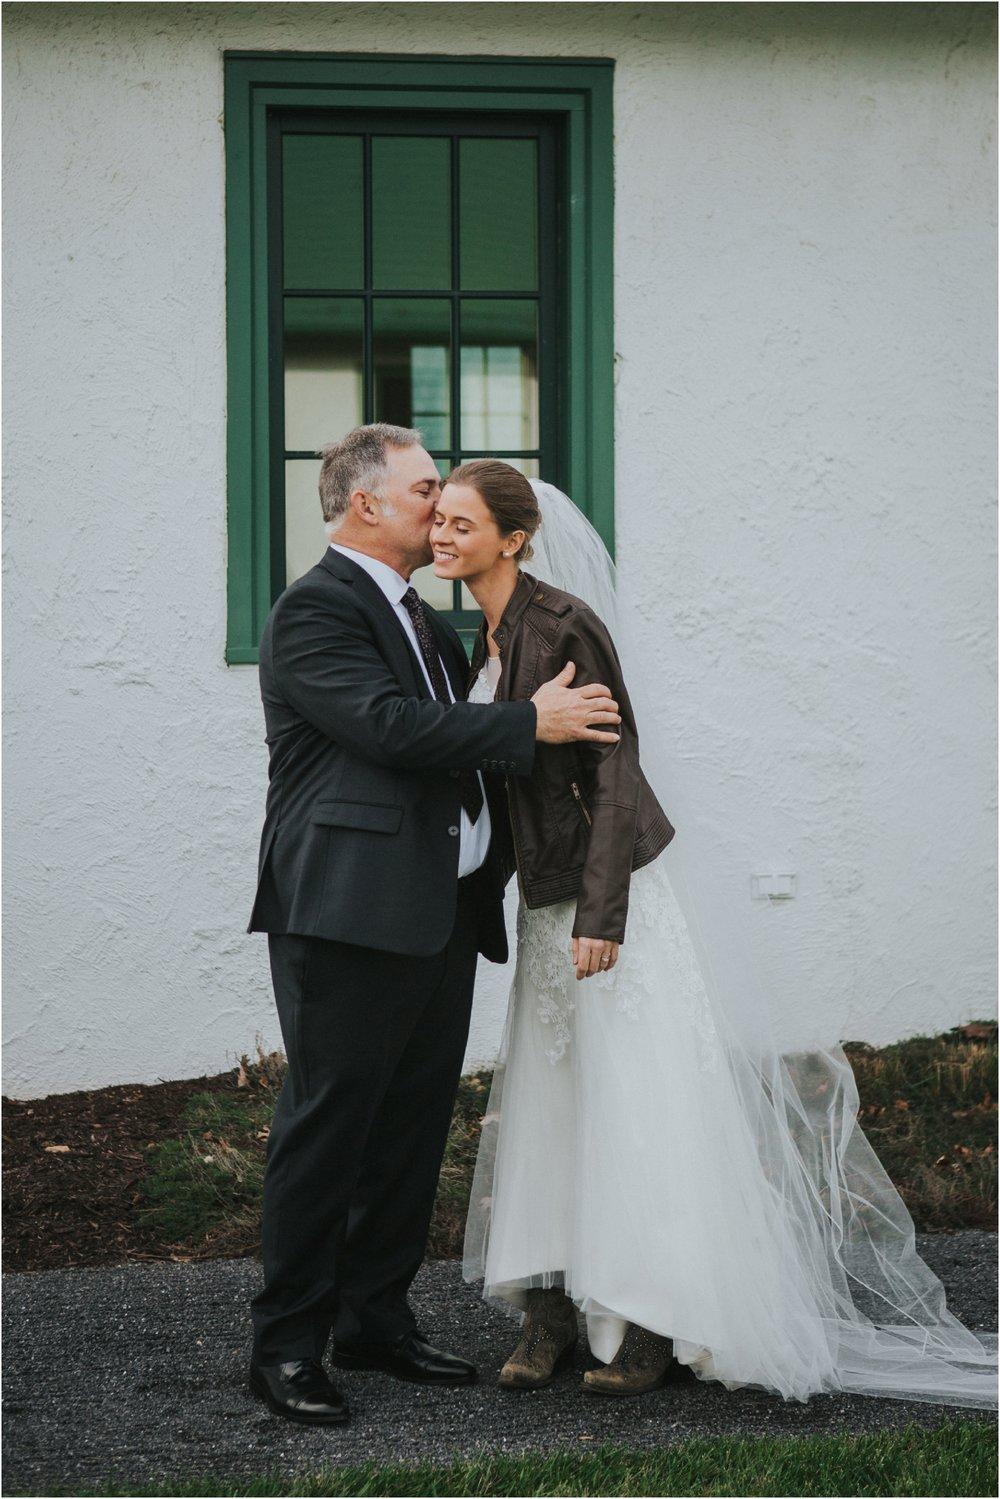 warm-springs-old-dairy-virginia-rustic-wedding-northeast-tennessee-elopement-adventuruous-photographer-katy-sergent_0023.jpg